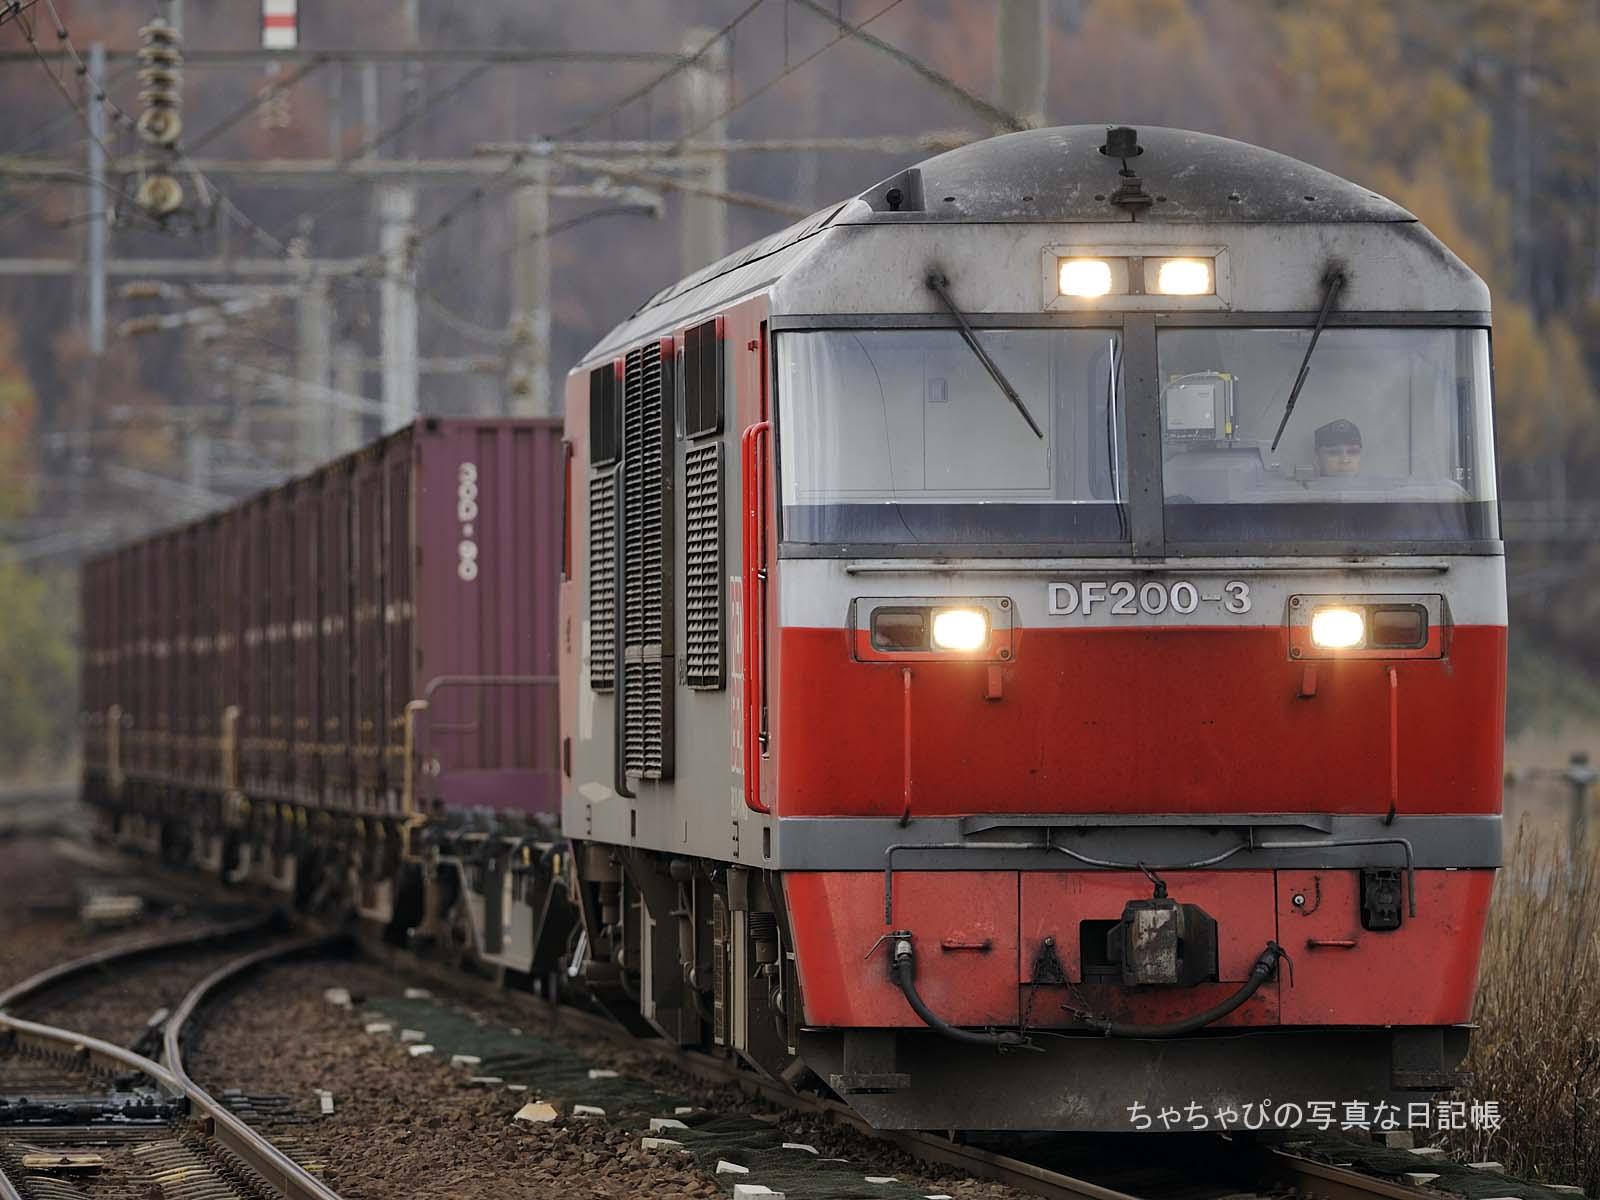 DF200-3